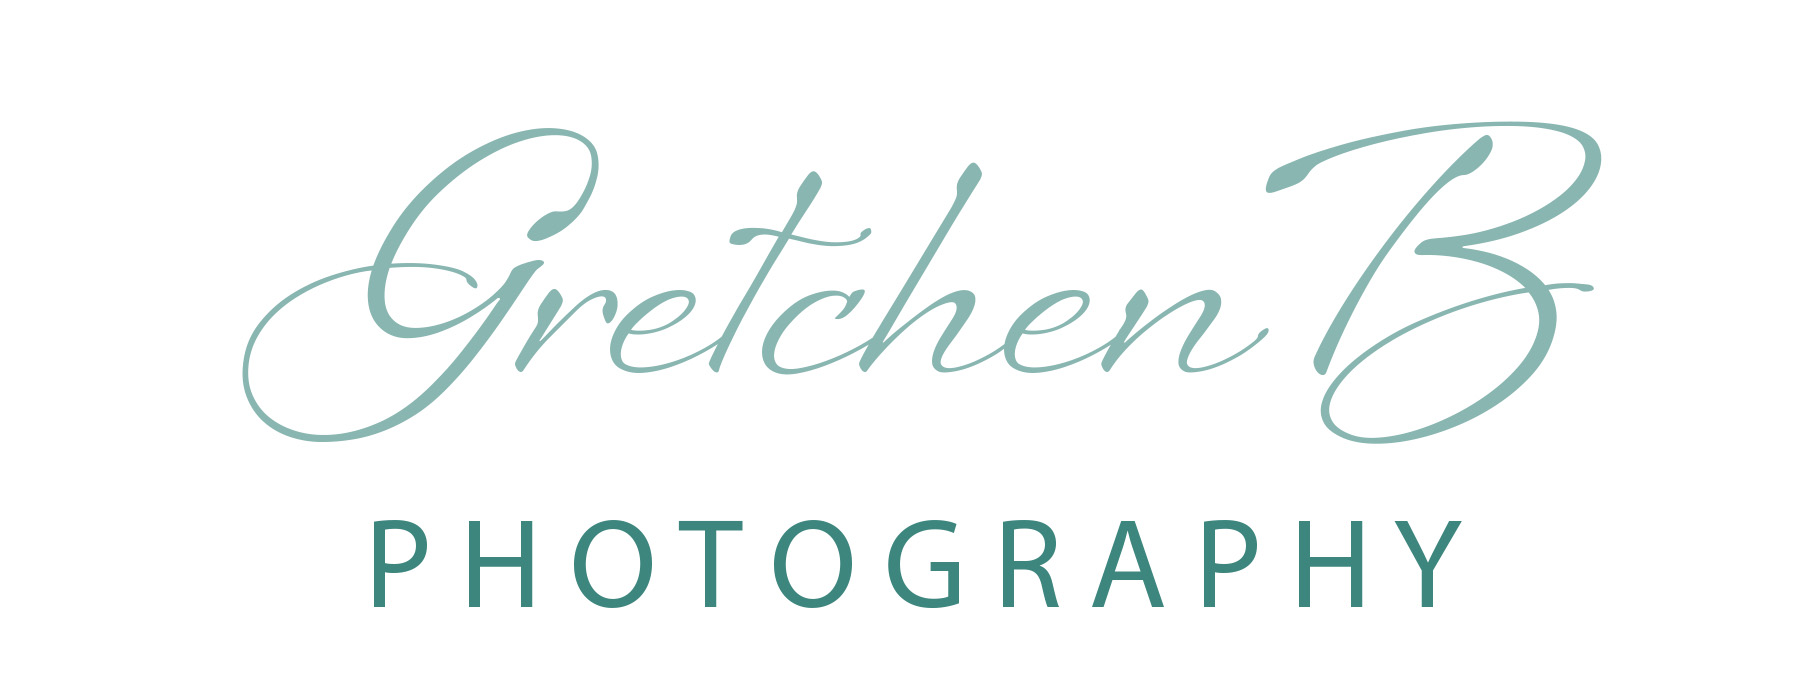 gretchen-b-photography.jpg